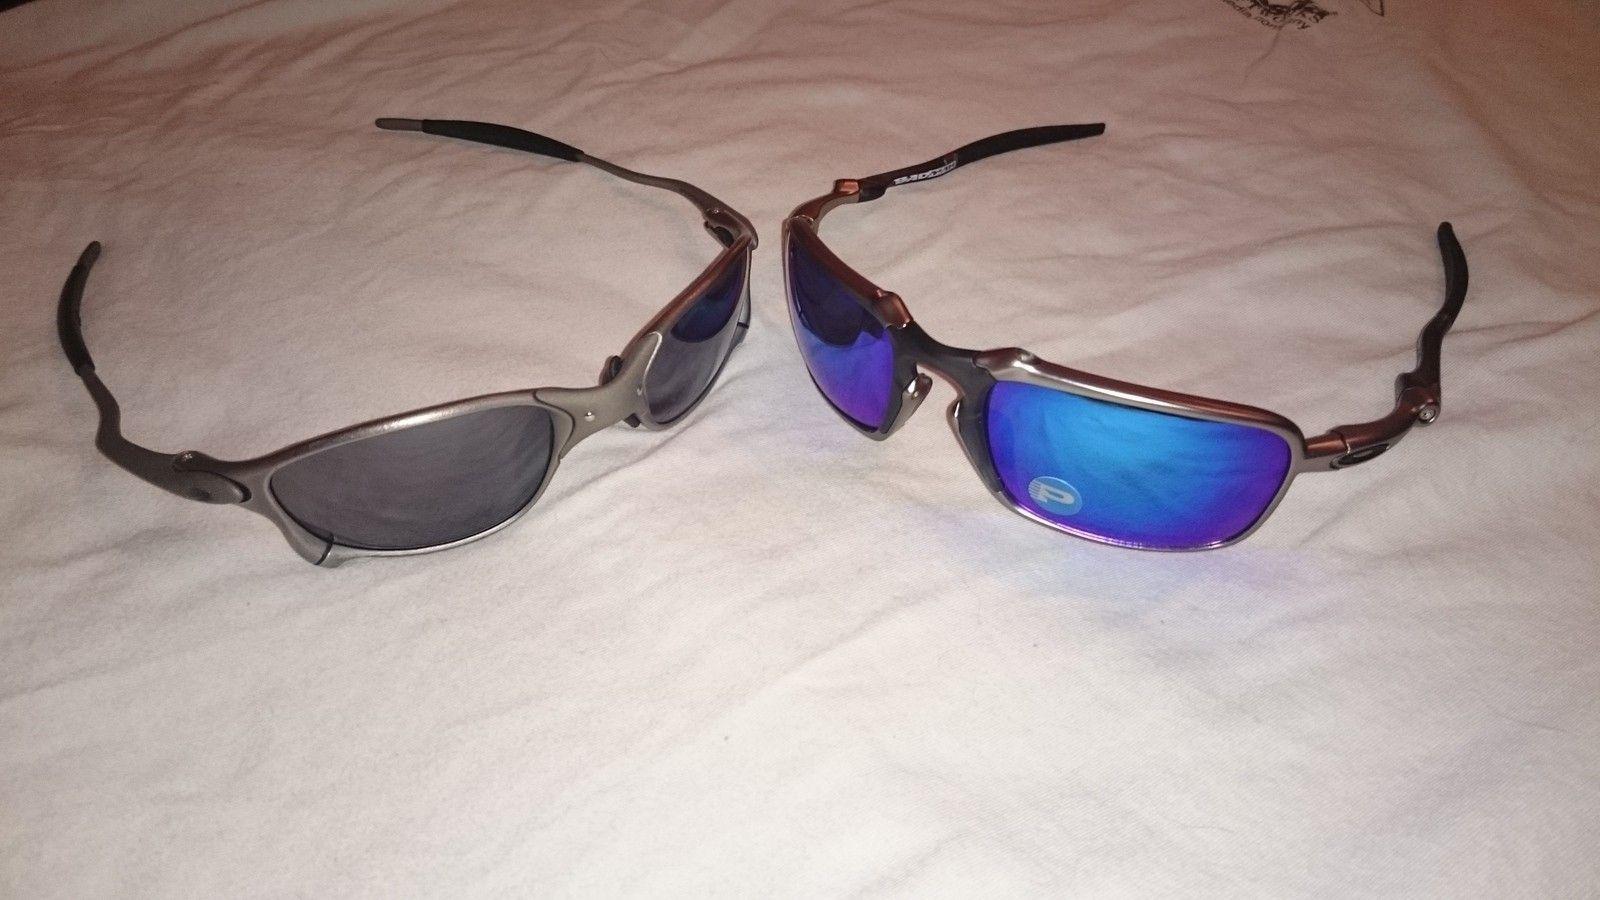 Old vs. New Oakley X-Metals - uploadfromtaptalk1424804899903.JPG